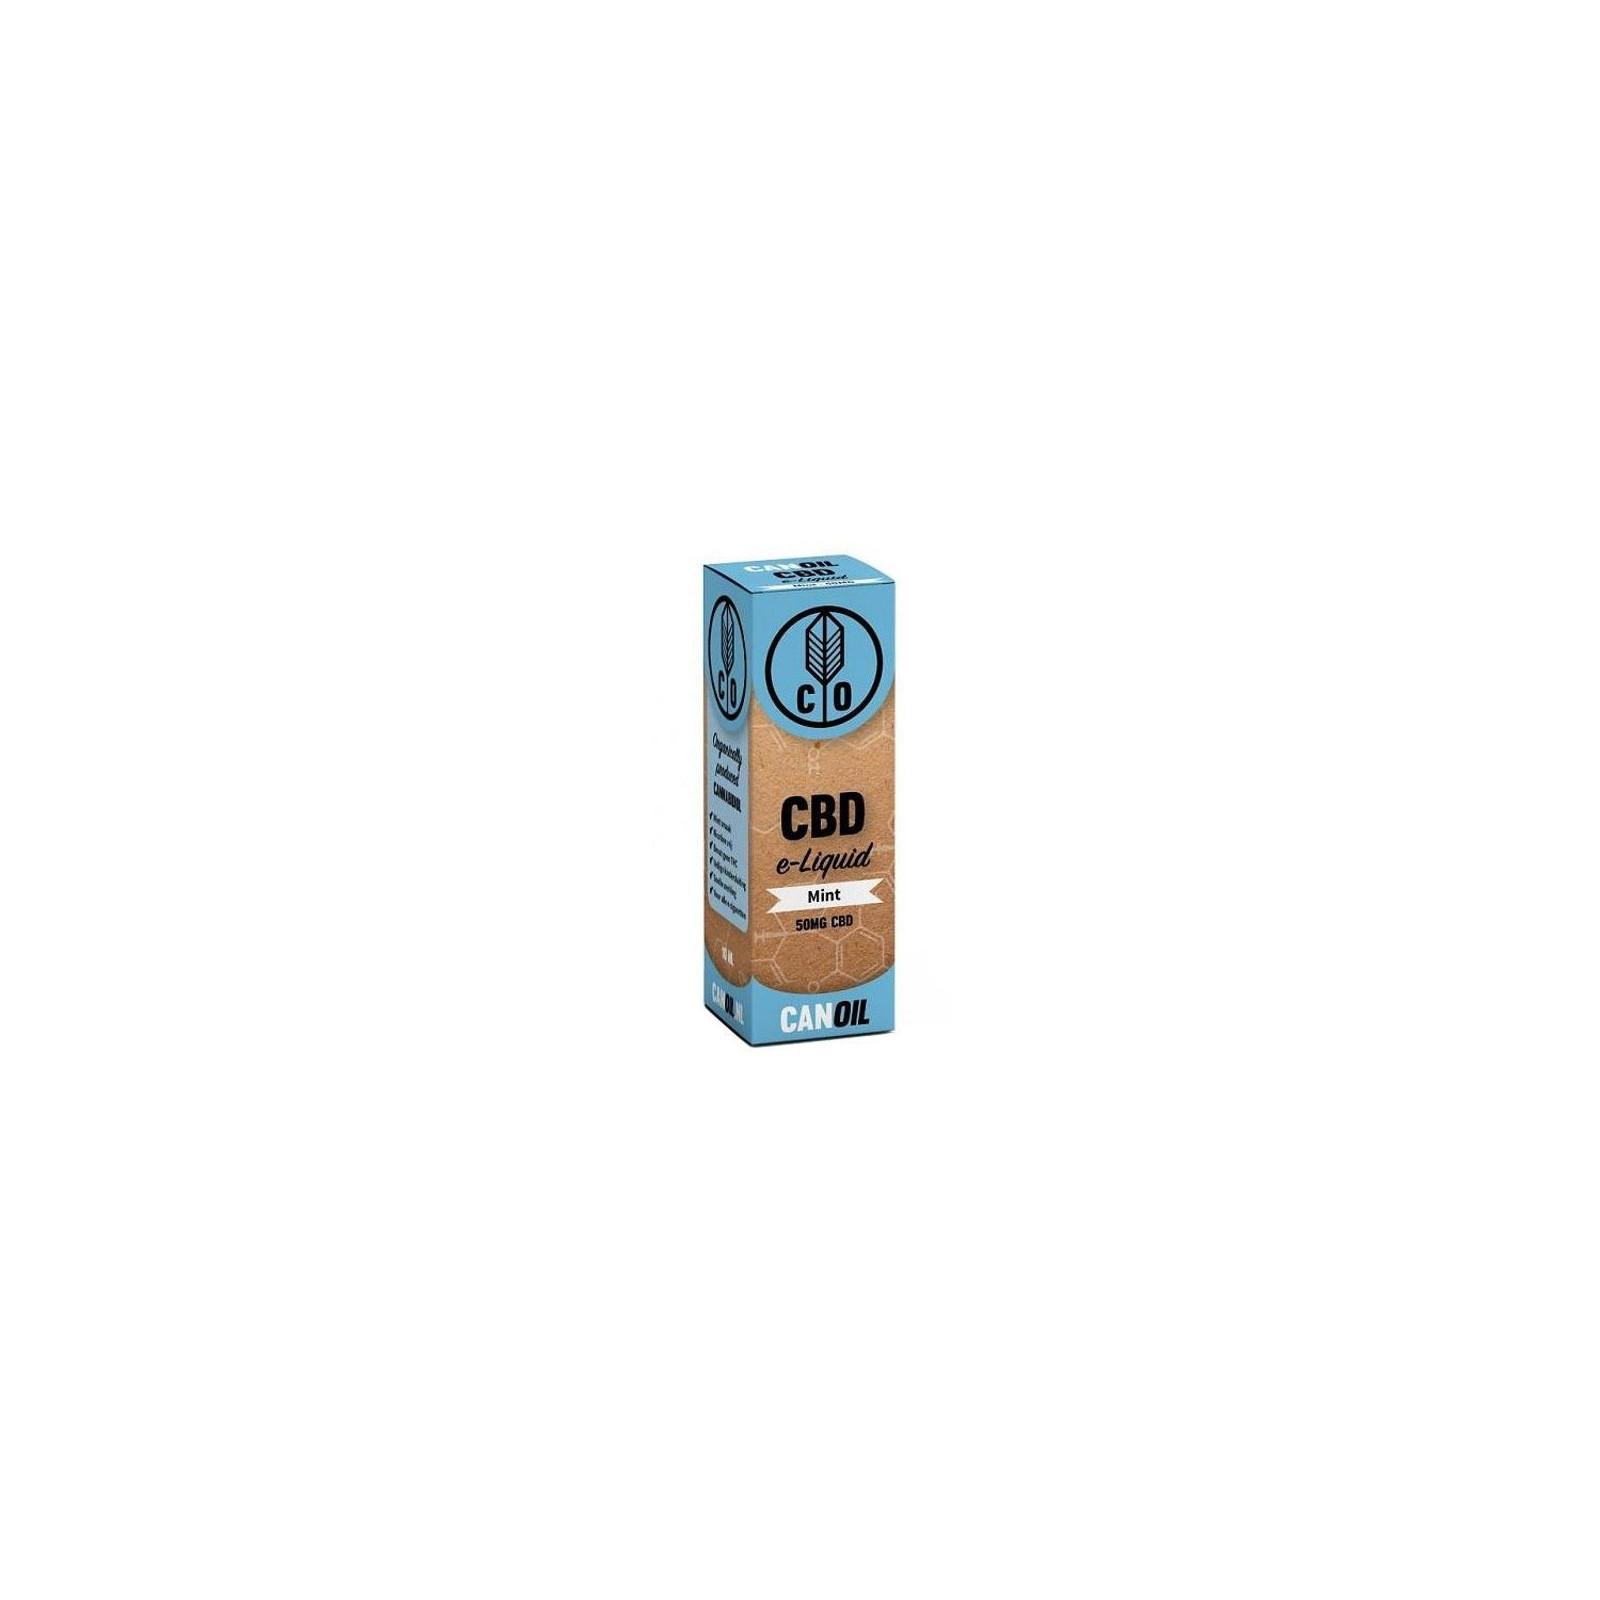 Mint CanOil CBD